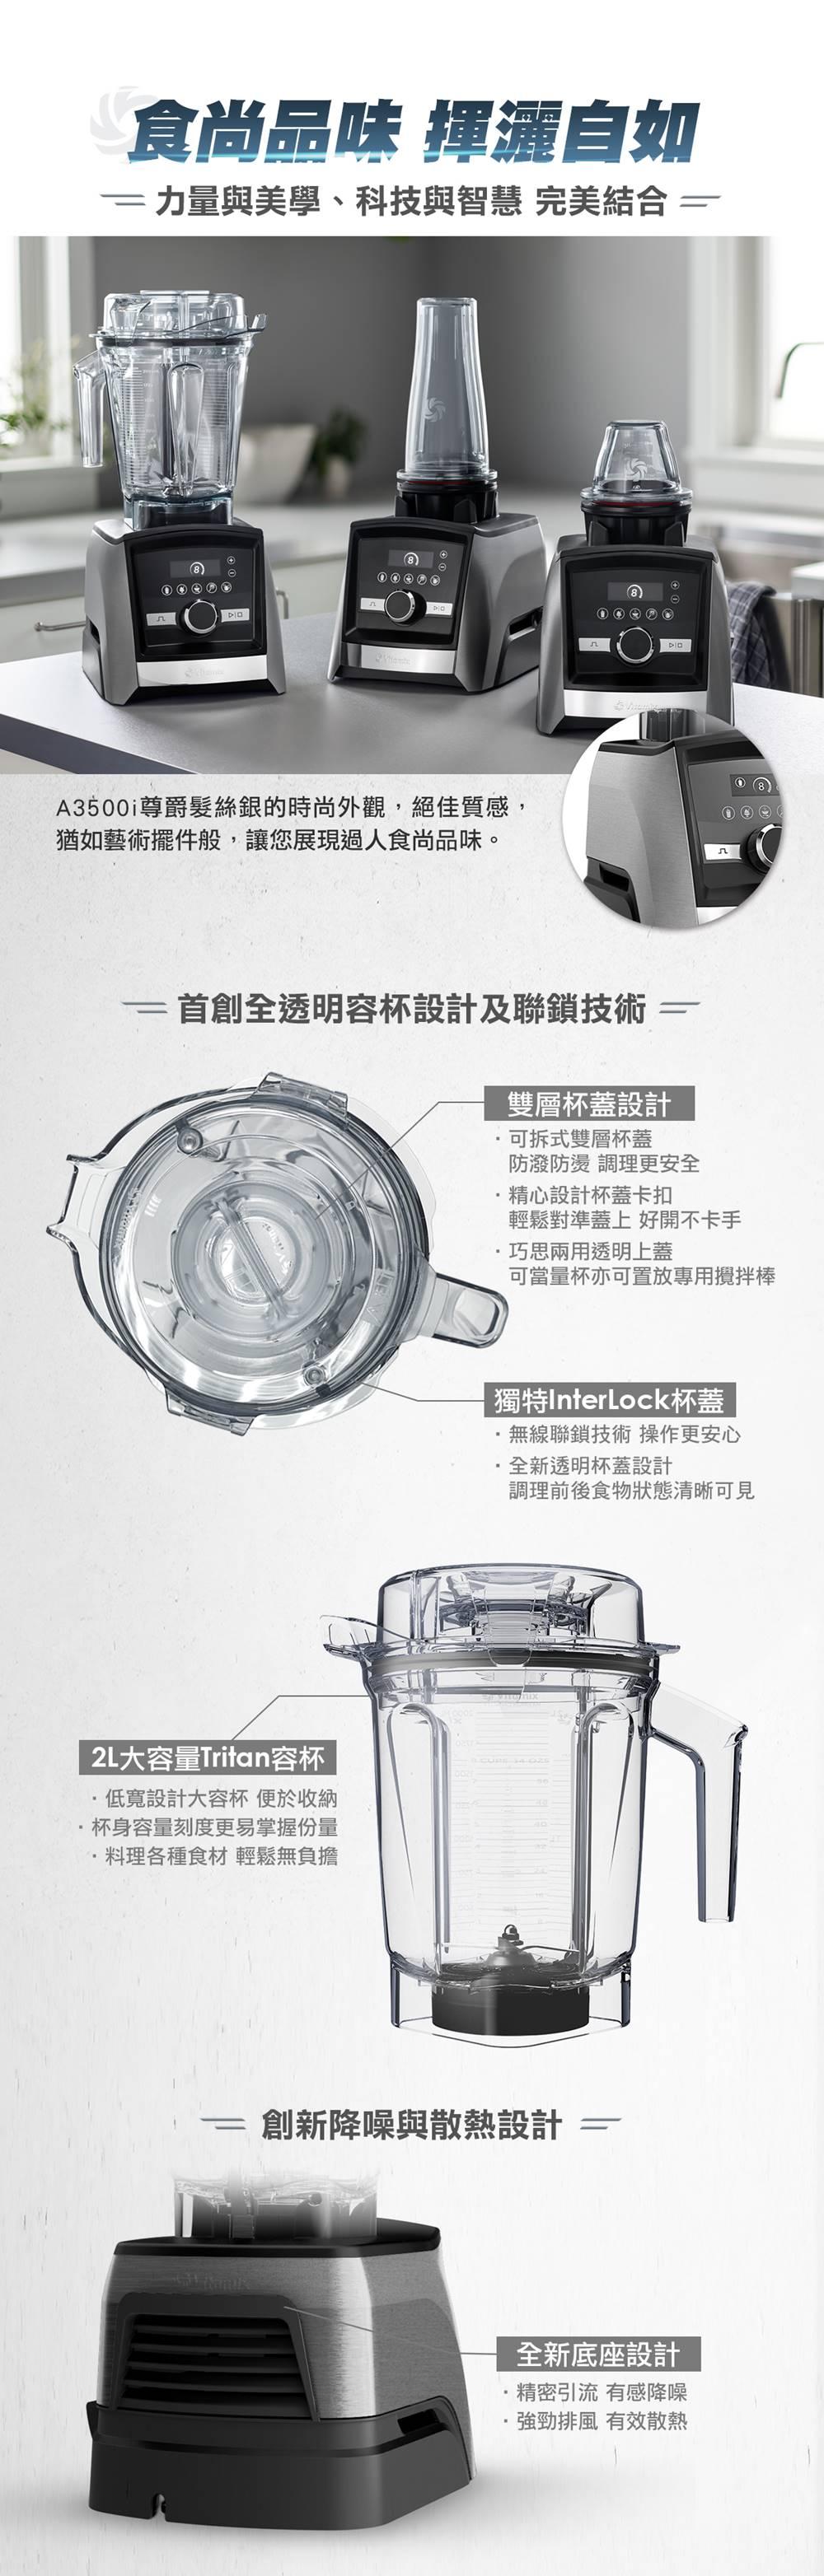 Vitamix-A3500i超跑級調理機-Ascent-食尚品味_尊爵髮絲銀質感_全新容杯與底座設計